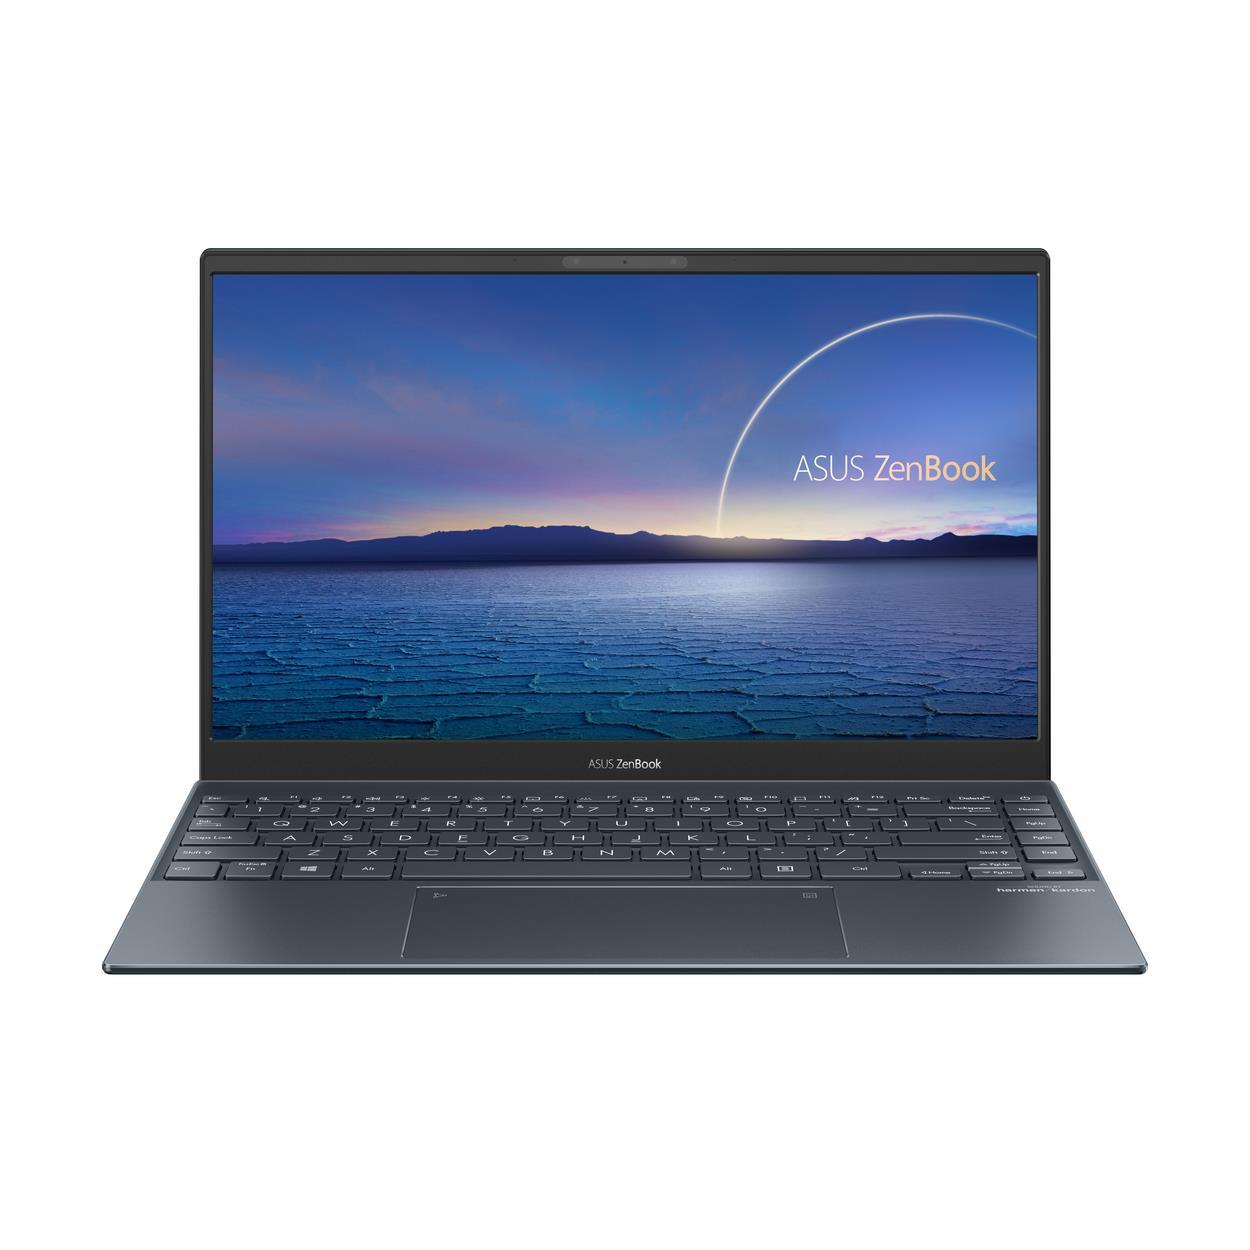 ASUS Zenbook UX325JA - 13,3'' FHD/IPS/Core i7-1065G7/8GB/512GB SSD/W10 Home (Pine Grey/Aluminum)